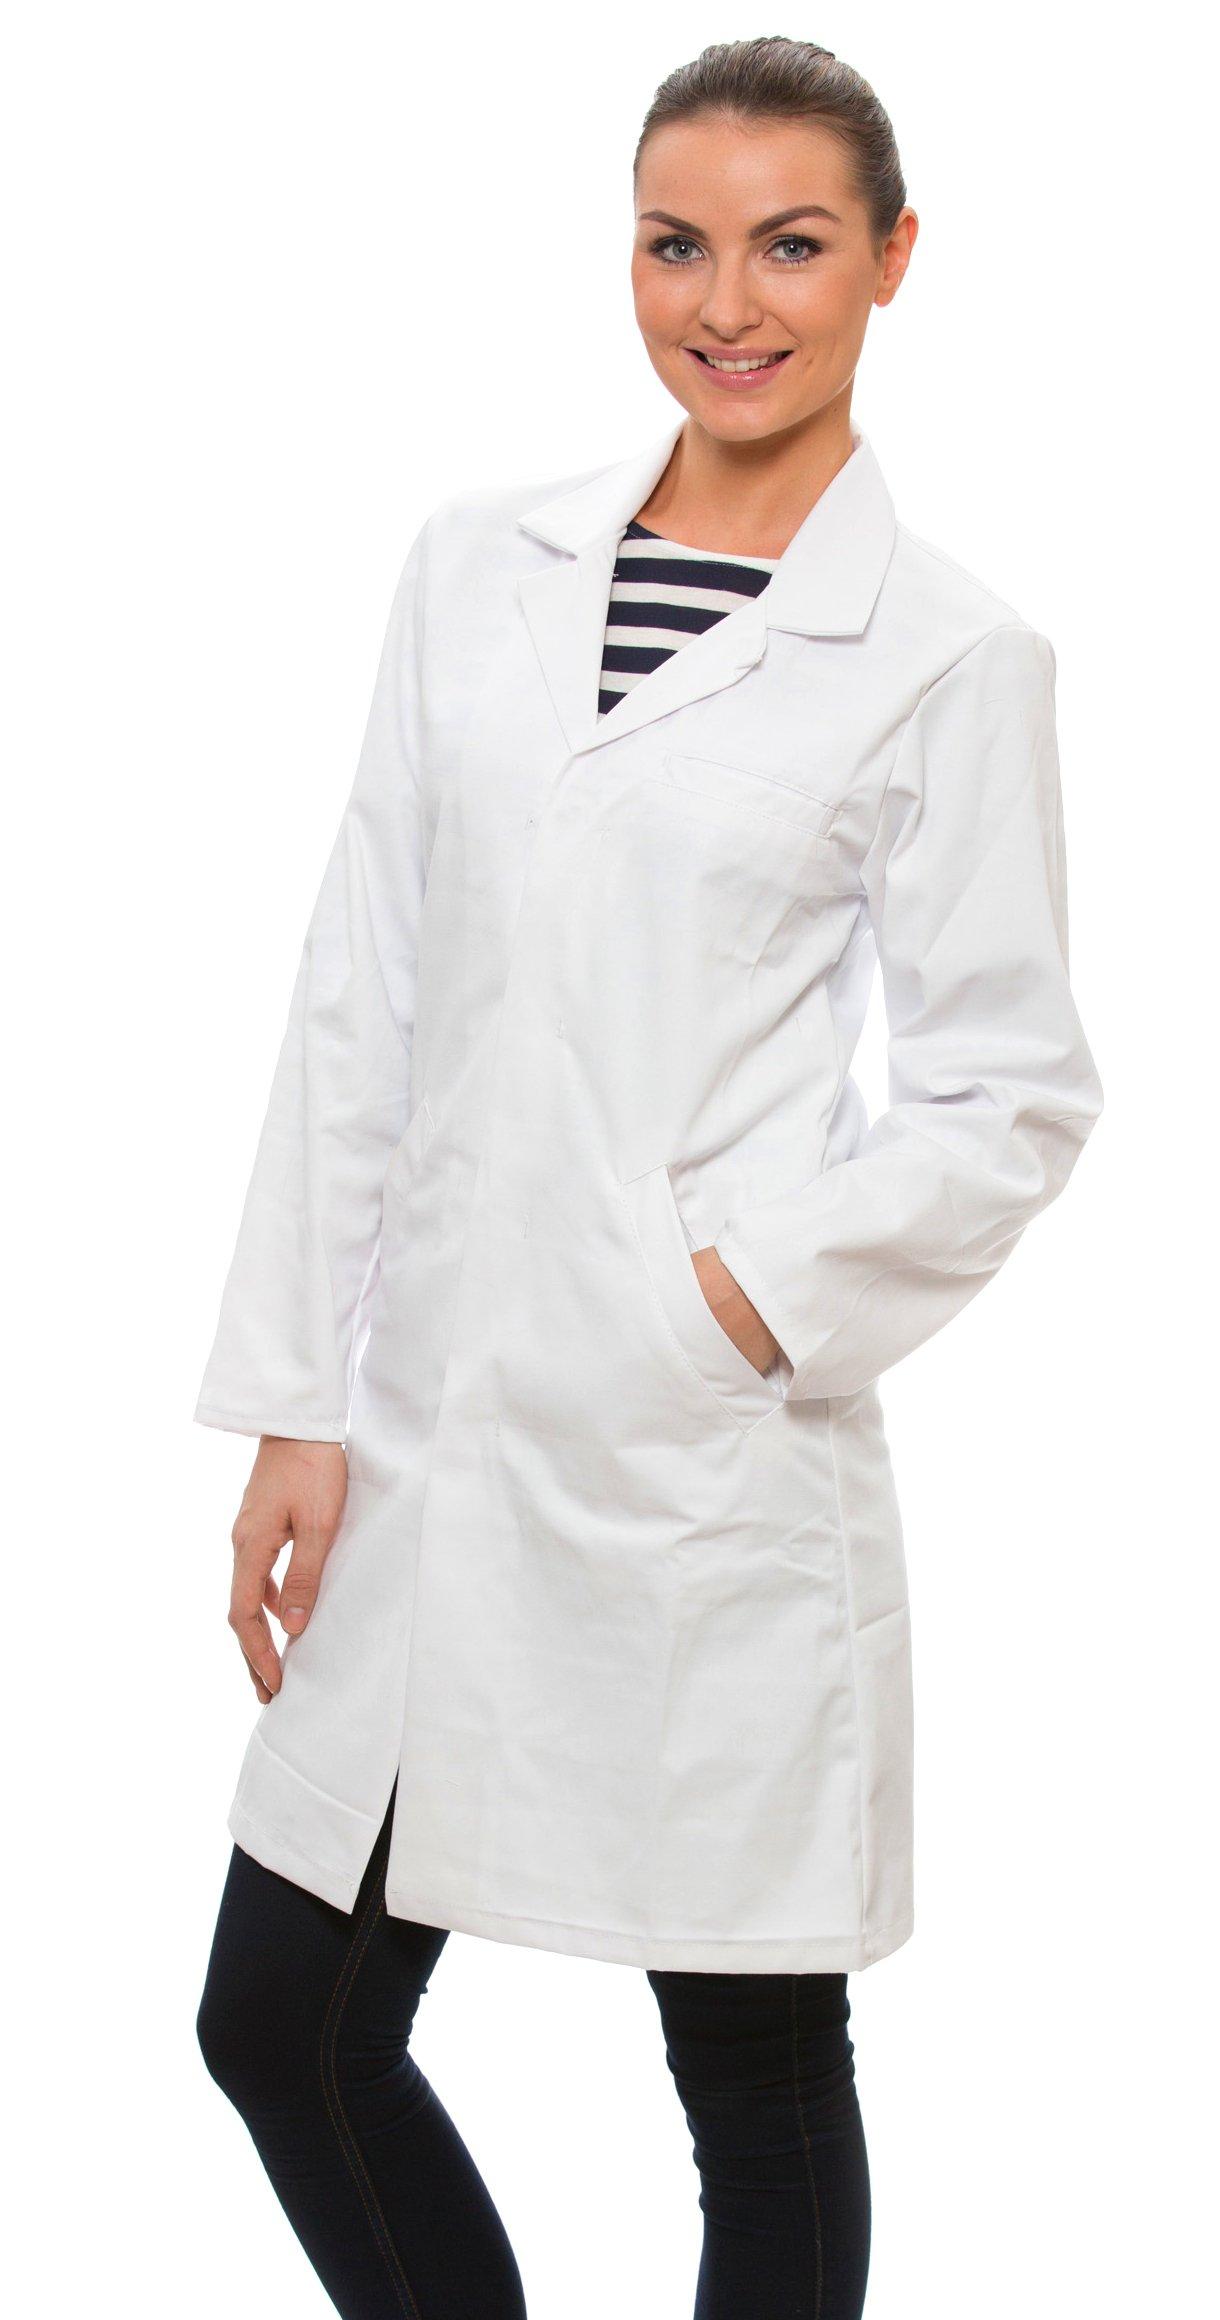 Dr. James Women's 100% Cotton White Lab Coat 39 Inch Length Size 6 US-04-C by Dr. James (Image #2)